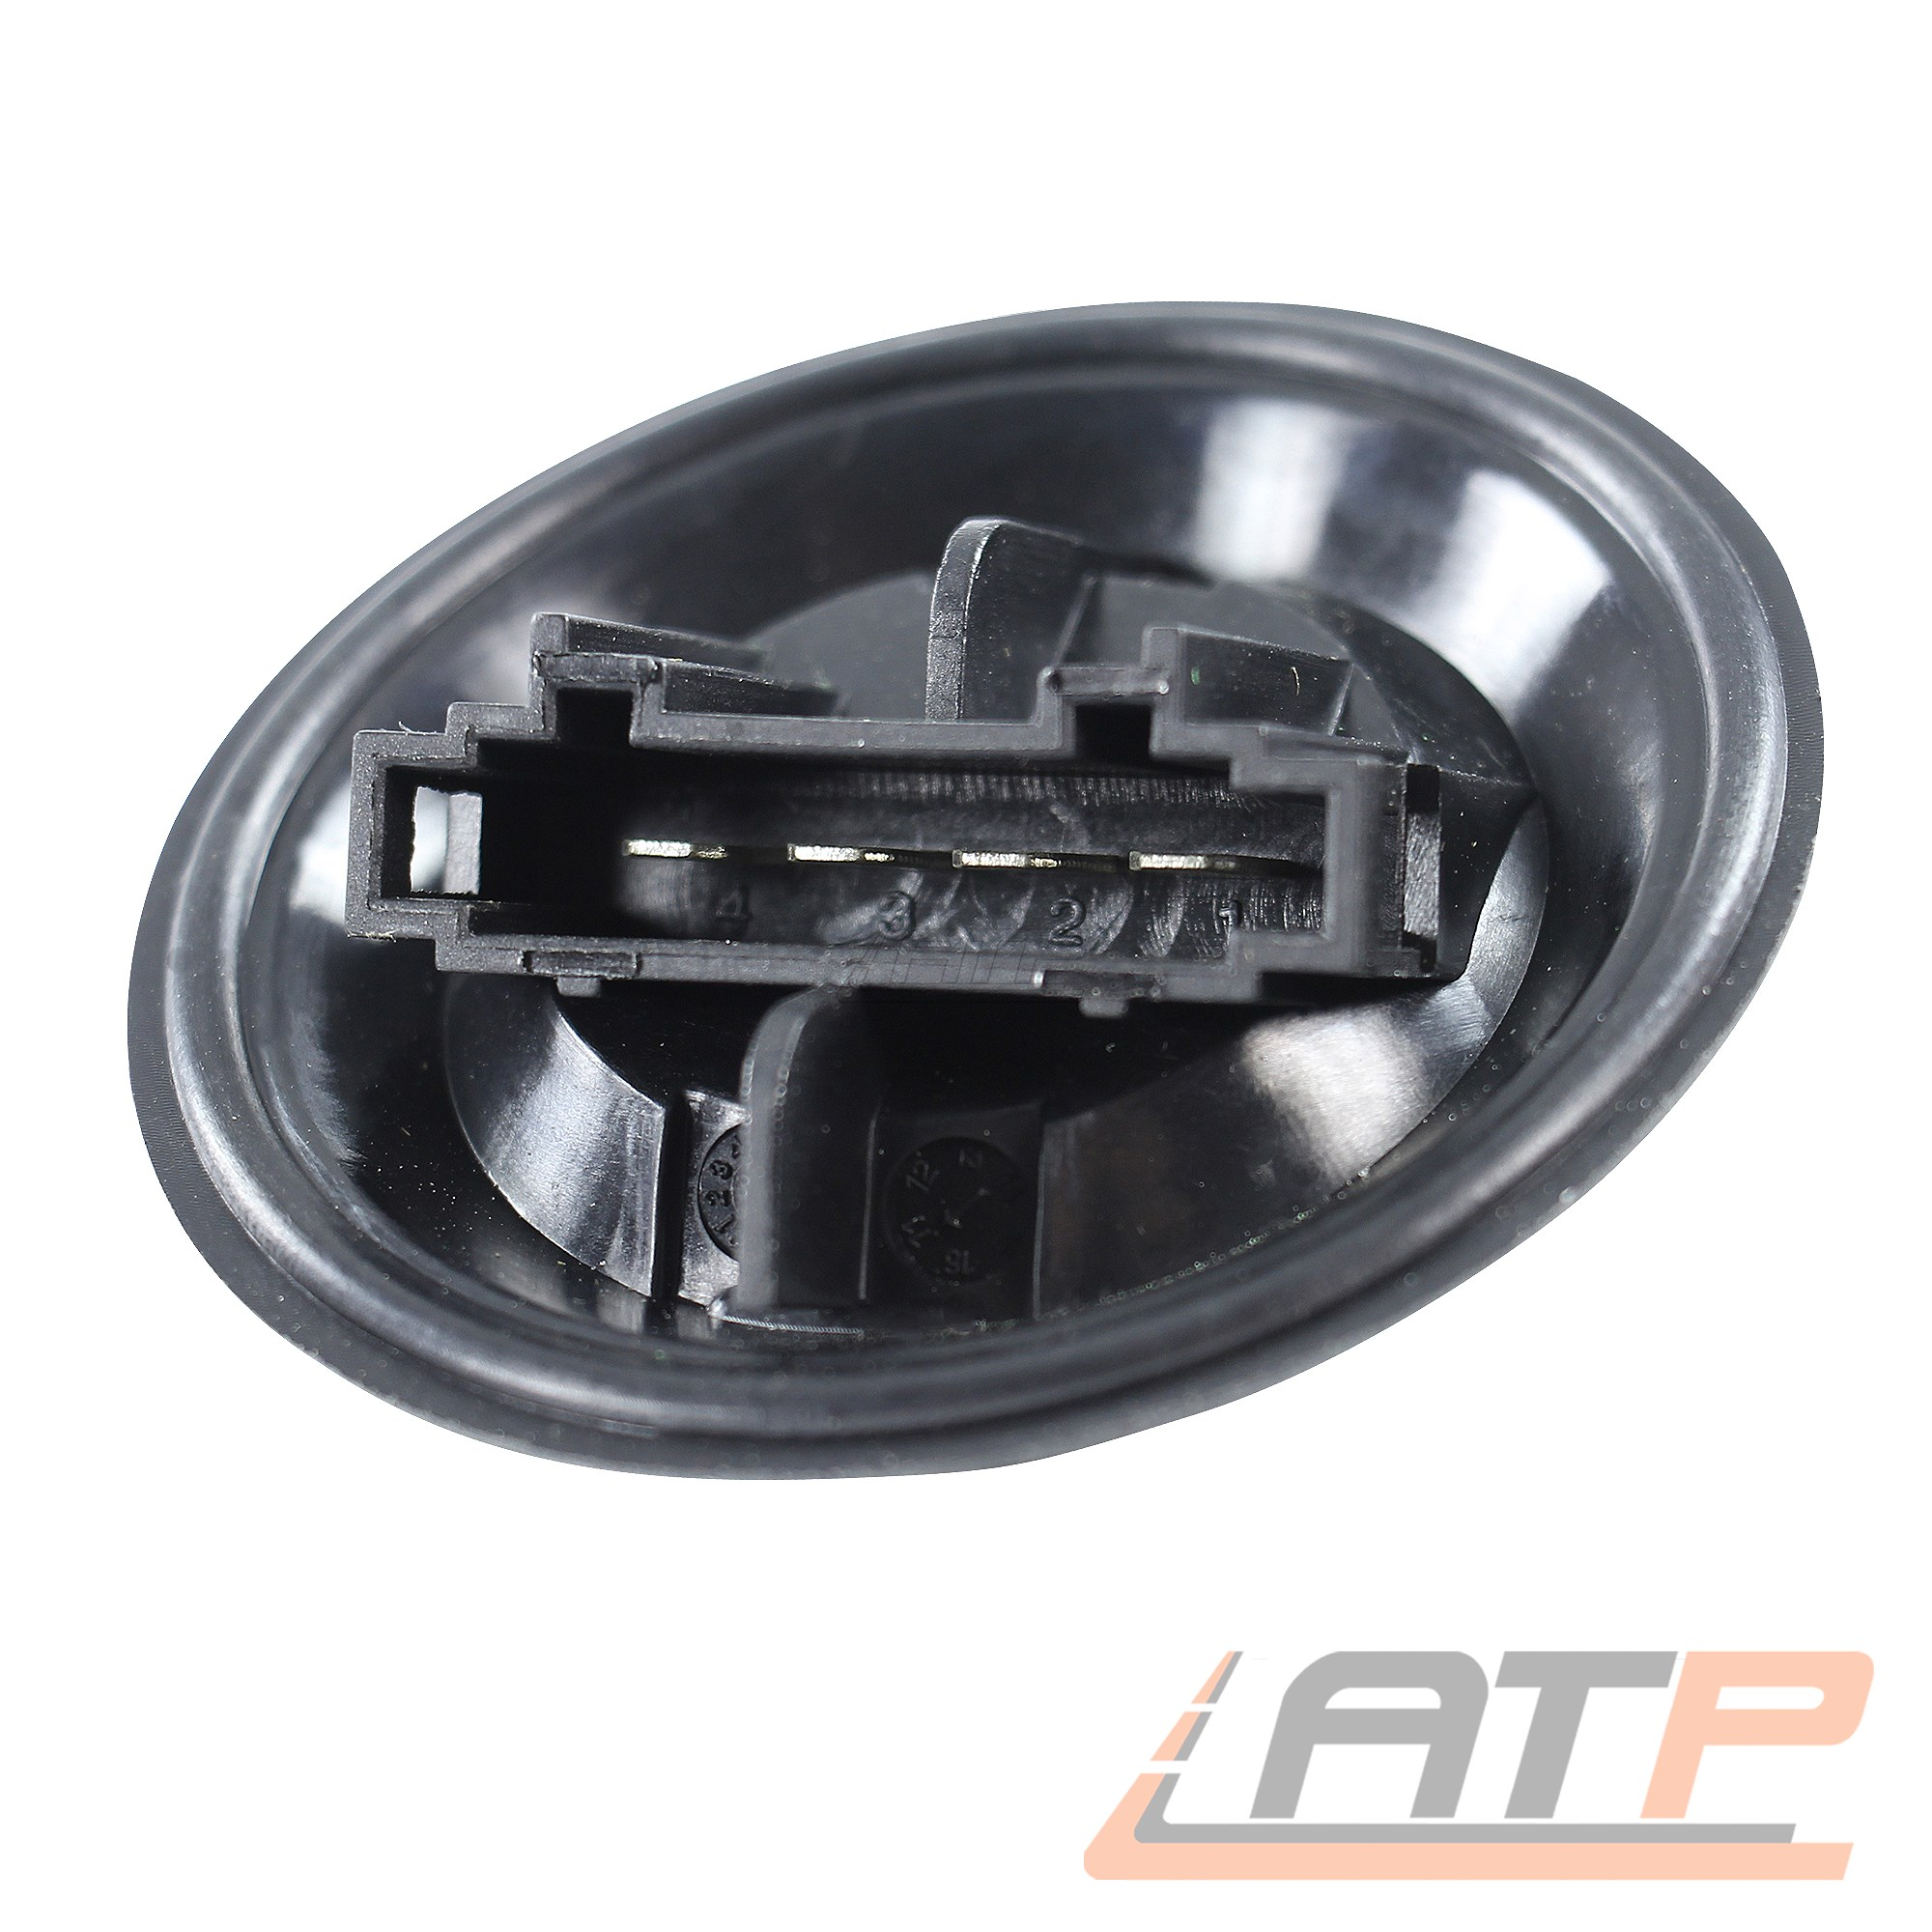 Résistance Chauffage ventilateur skoda FABIA 6y BJ 99-08